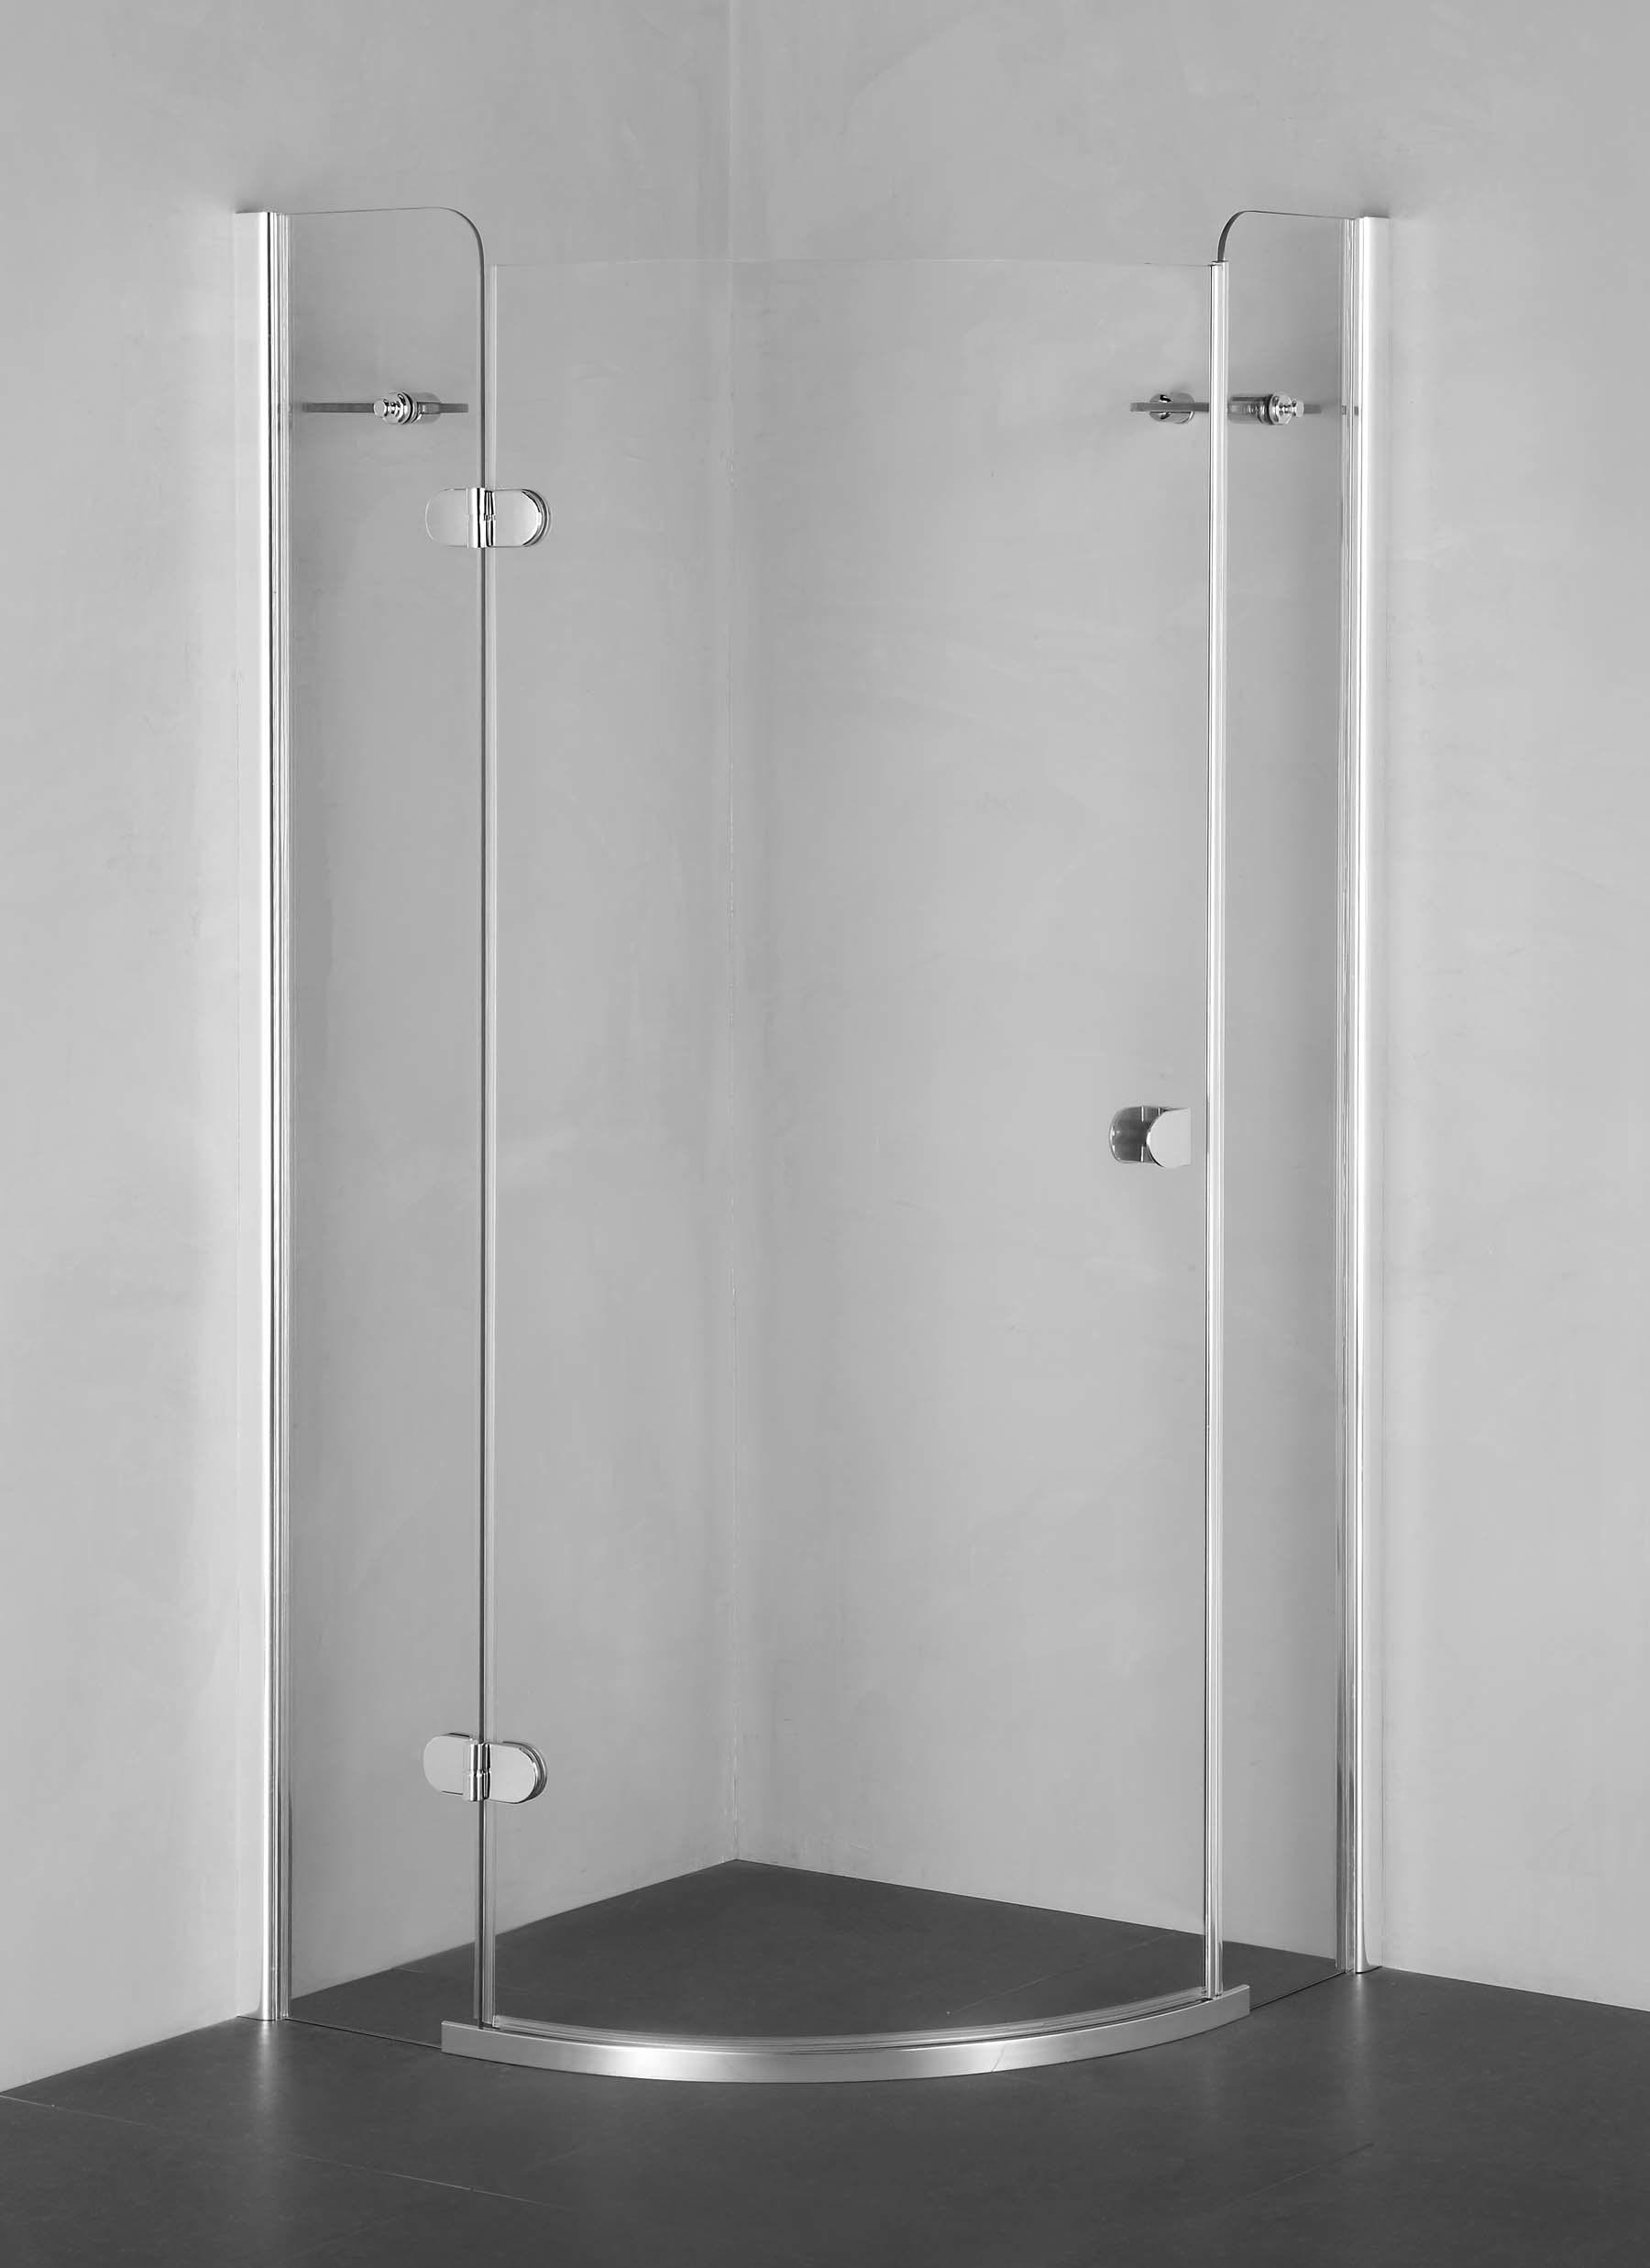 China Curved Pivot Shower Screen Shower Door Ap8361s China